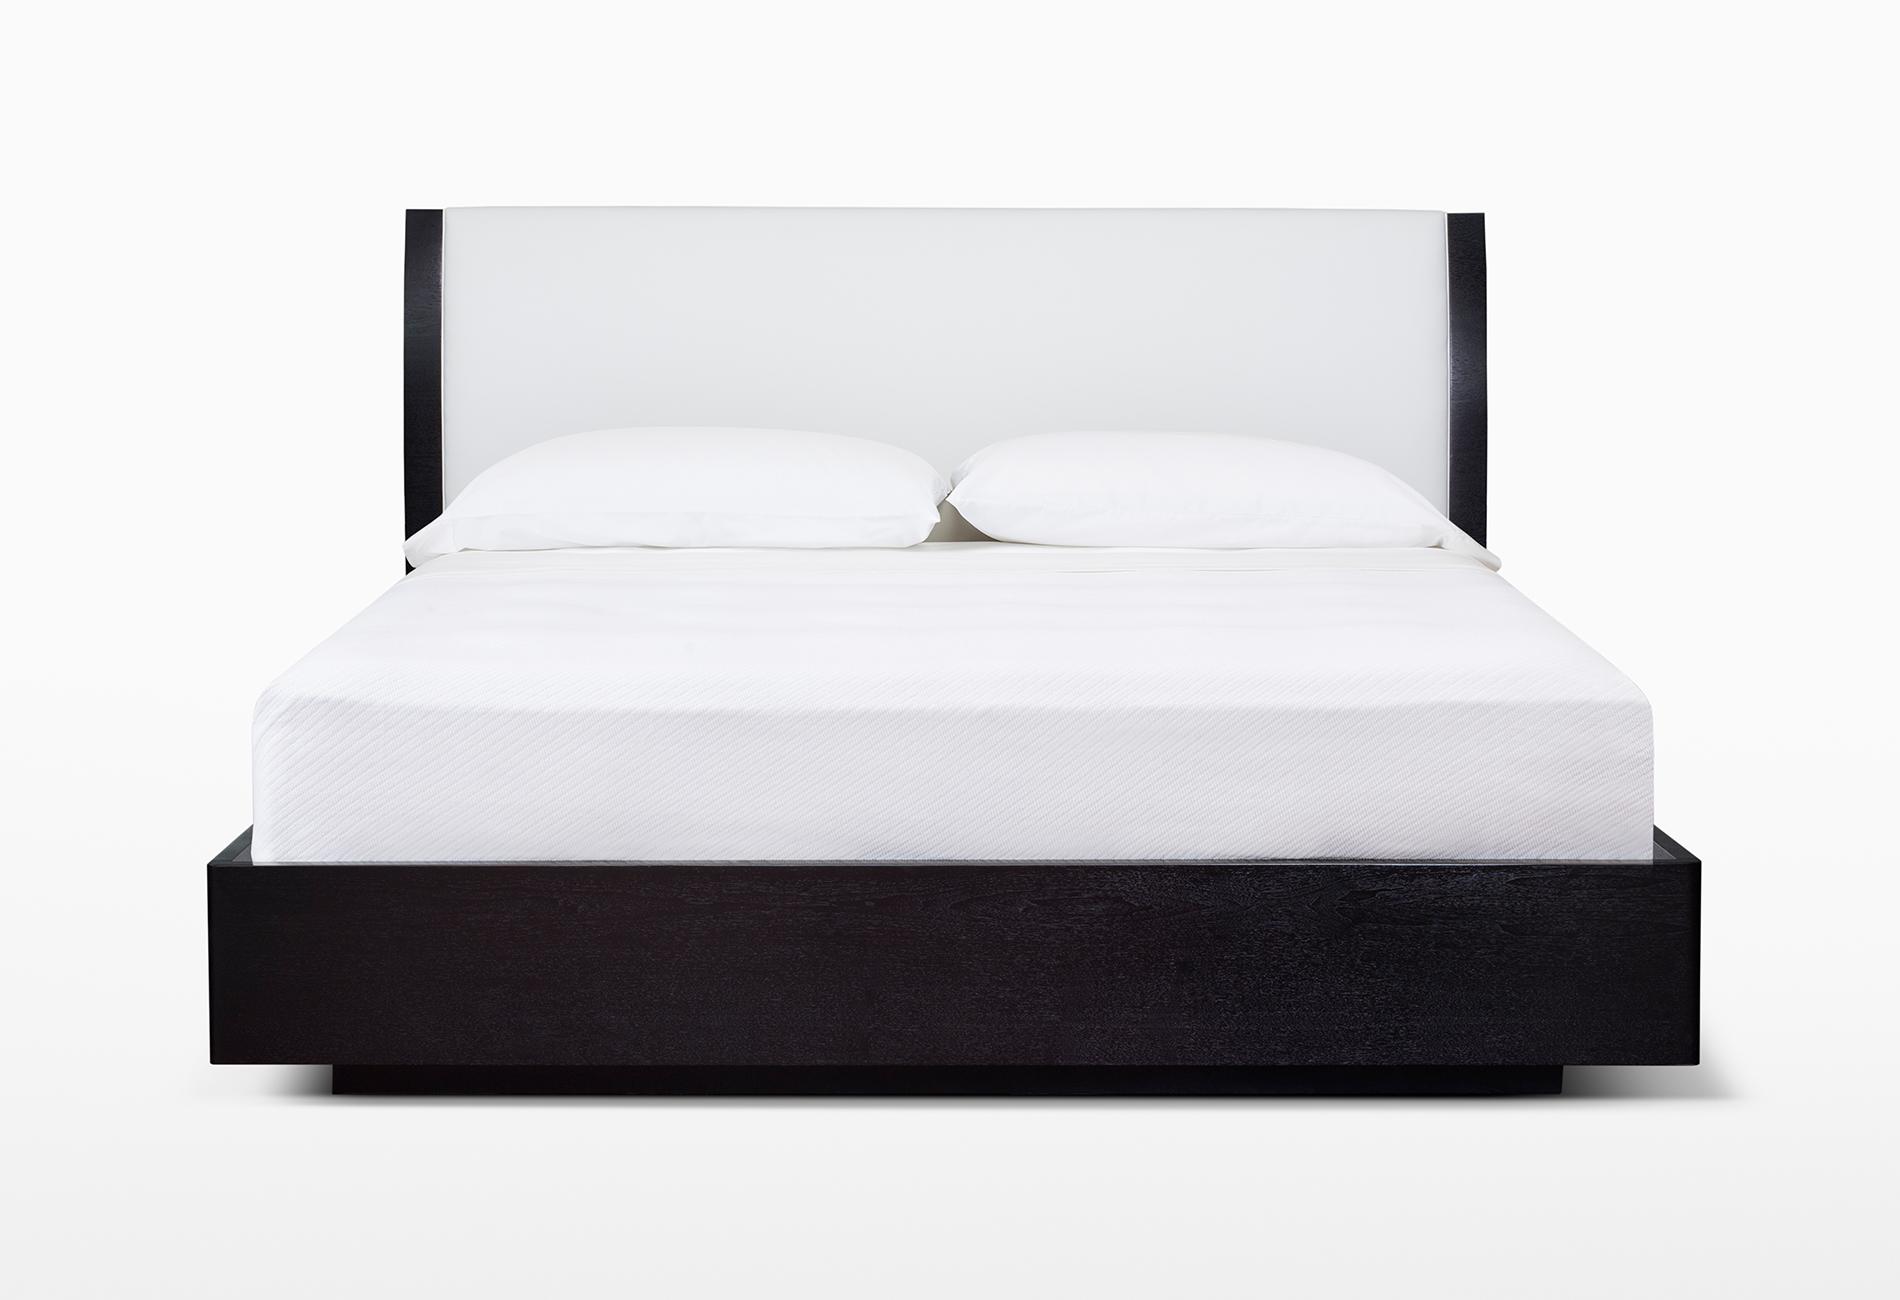 CMS Avalon Bed Walnut (1).jpg